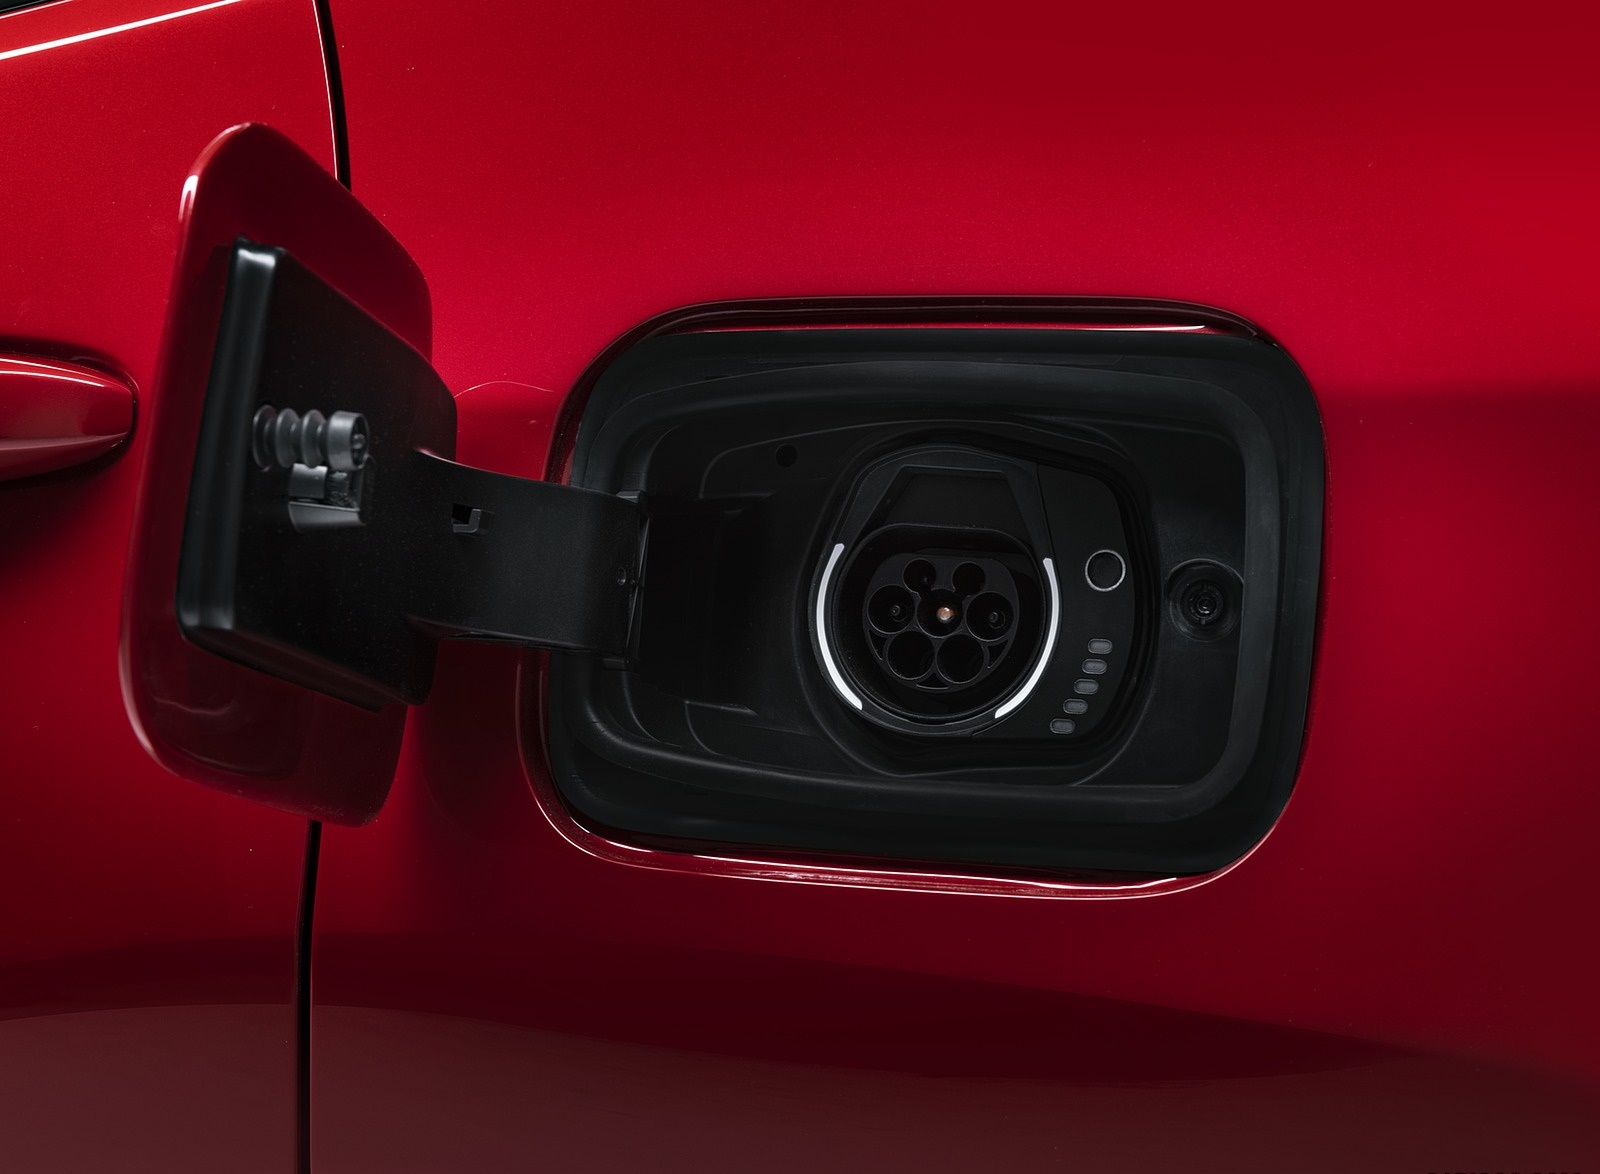 2020 Jeep Compass PHEV Detail Wallpaper (8)